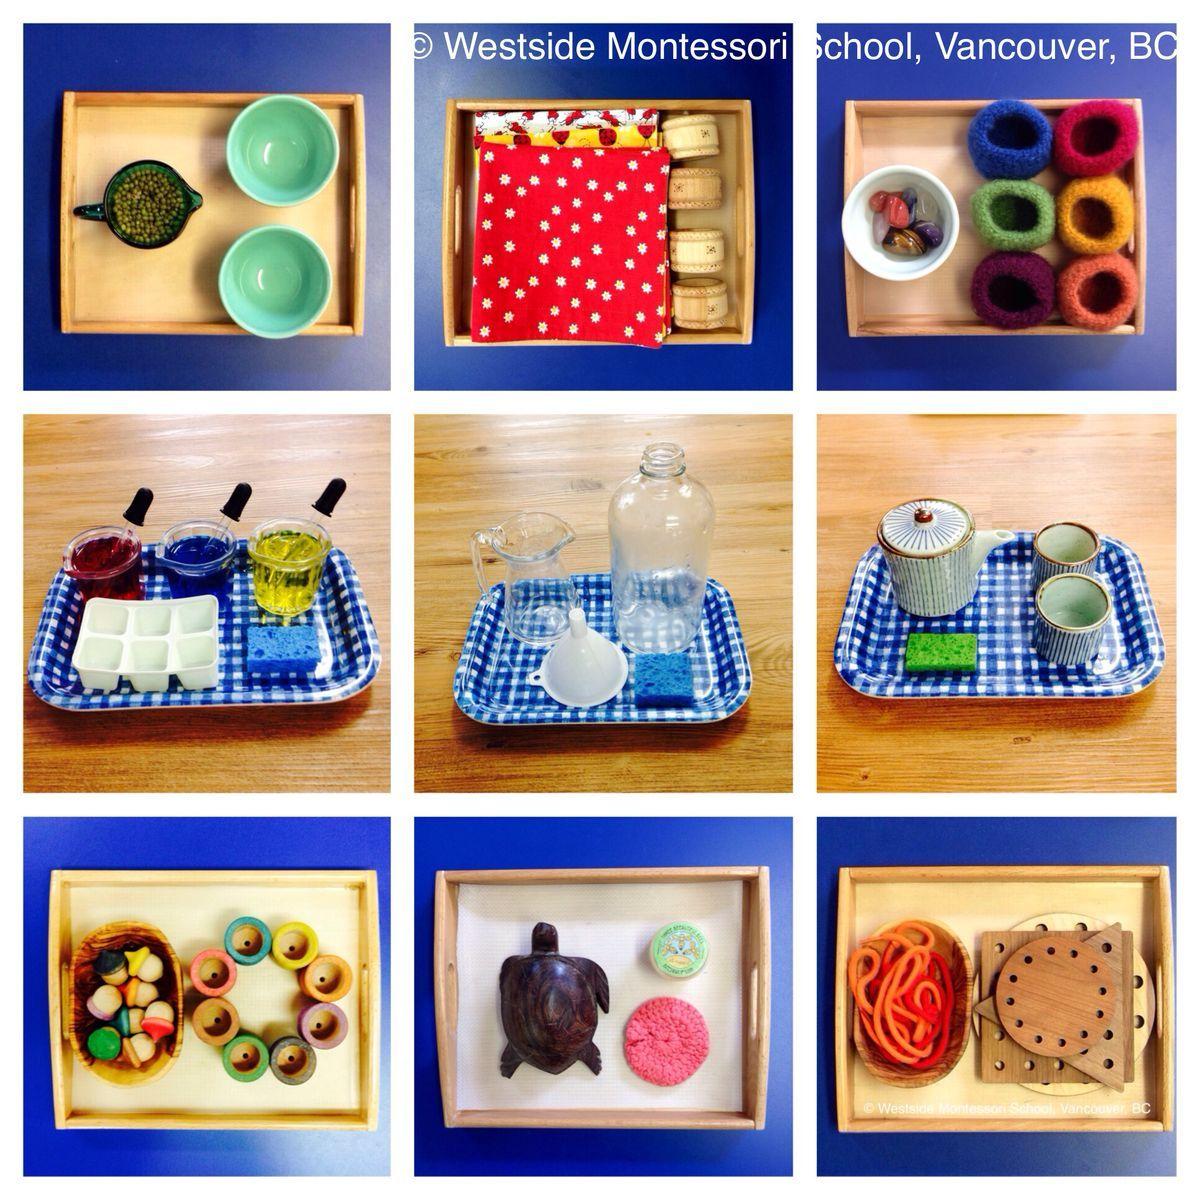 30800a8bef6394974948bcb2b91bd5bf Jpg 1 200 215 1 200 Pixels Montessori Practical Life Montessori